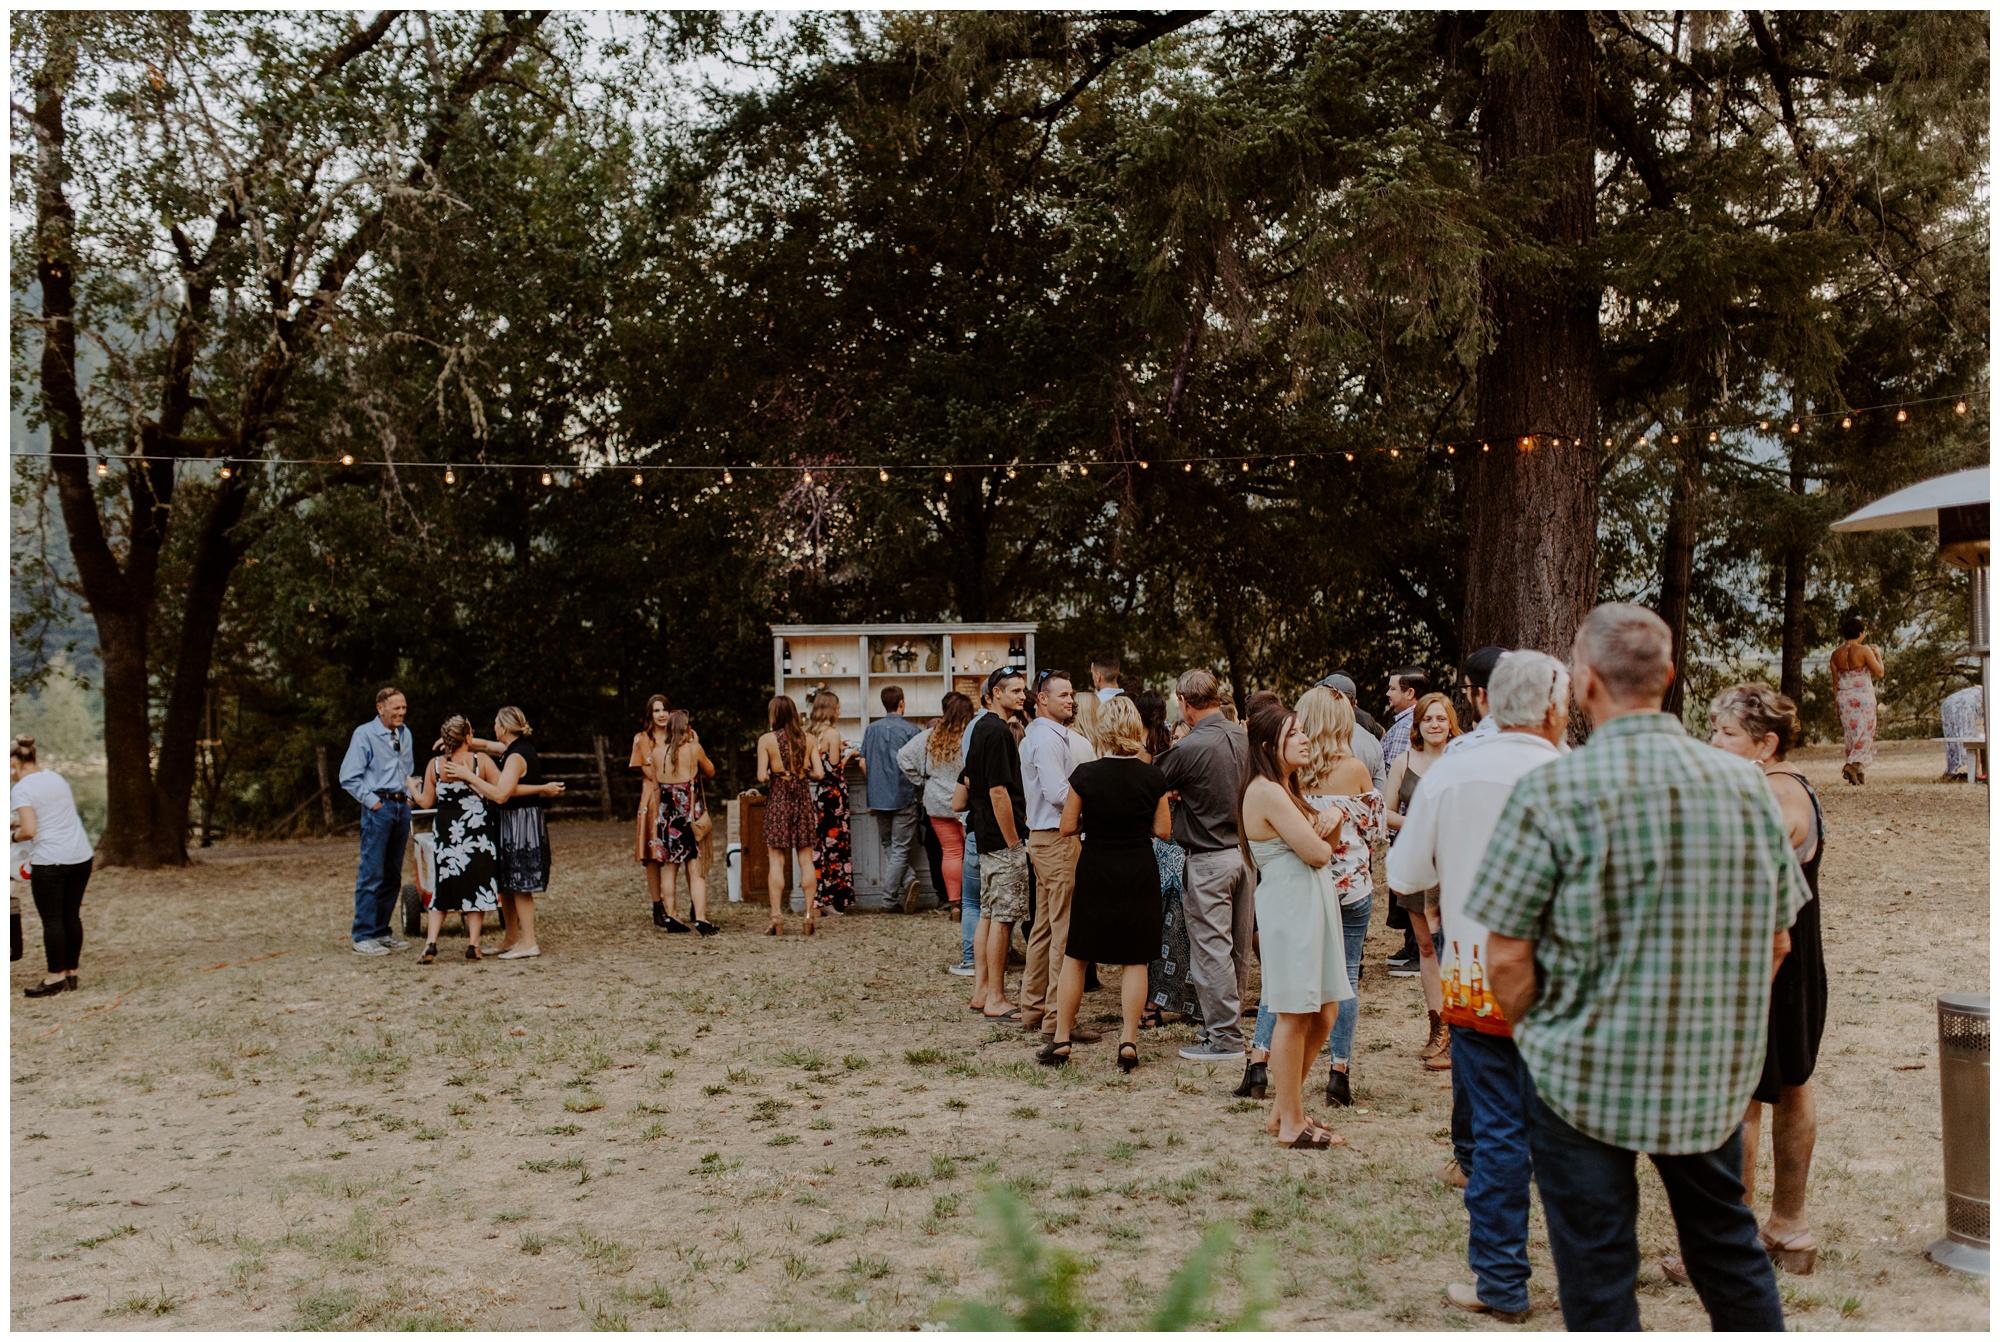 Redwood Festival Wedding Humbolt California - Jessica Heron Images_0070.jpg